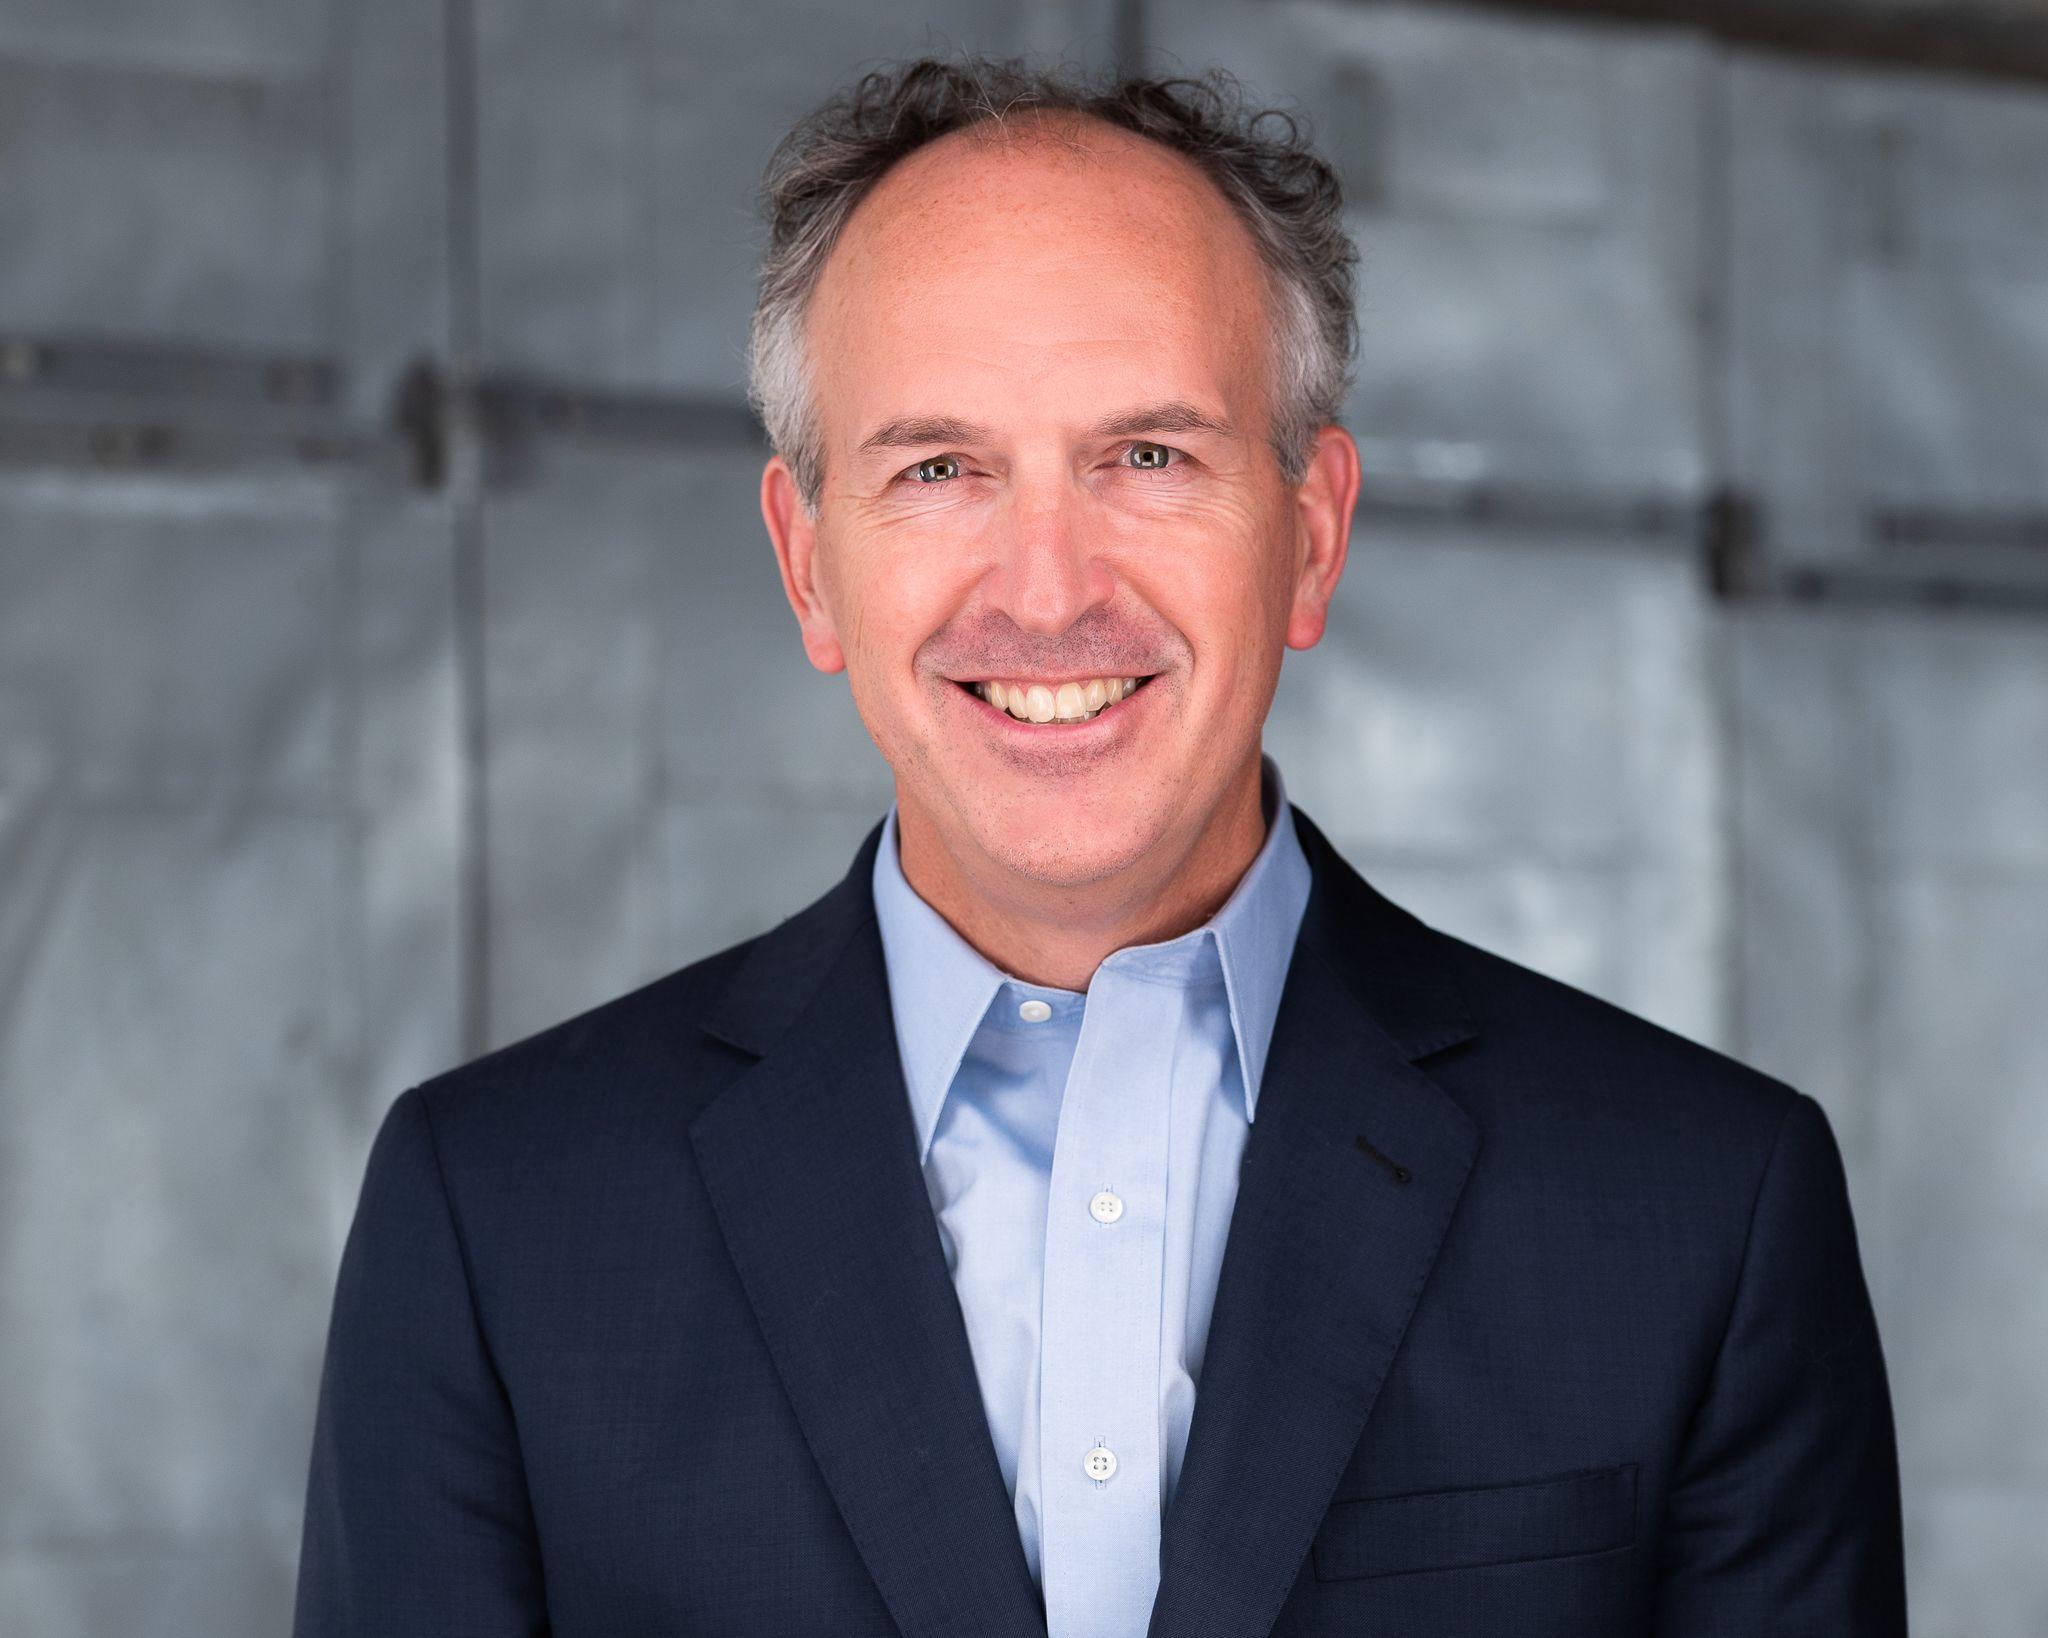 David Corderman. Chairman